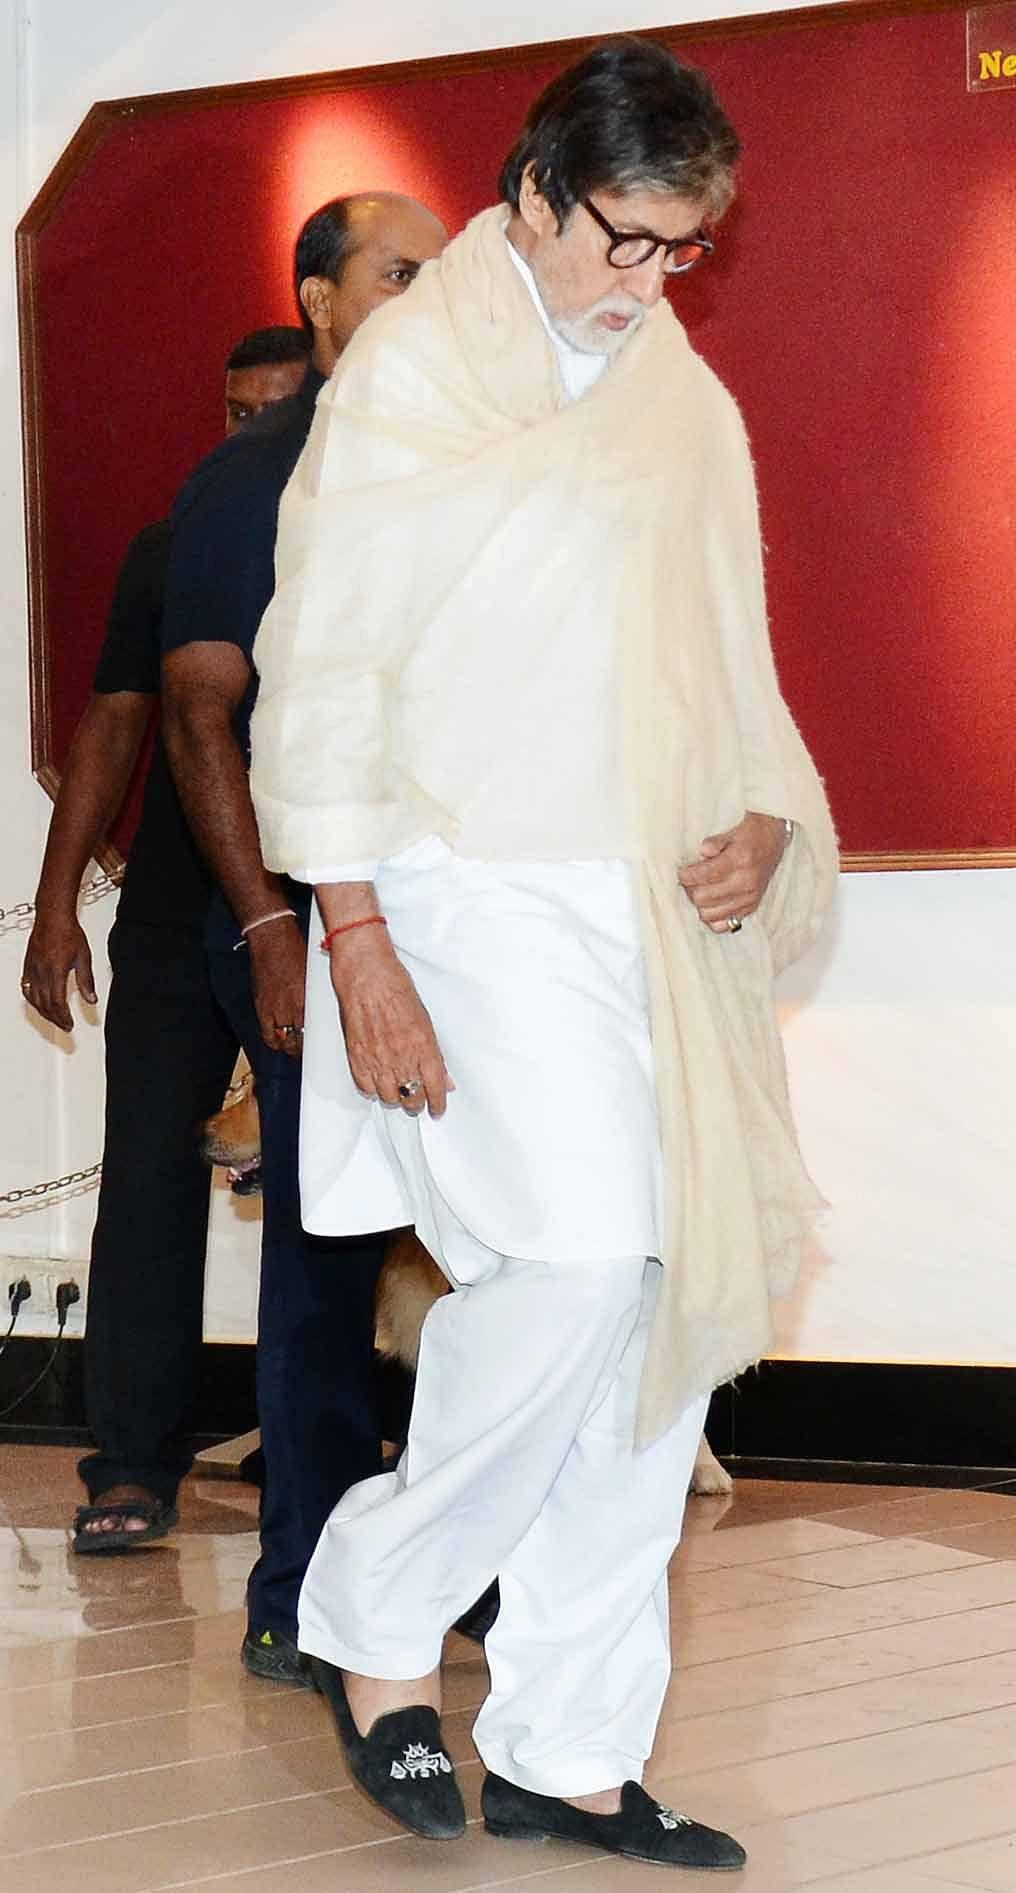 Amitabh Bachchan arrives for the prayer meeting. (Photo: Yogen Shah)